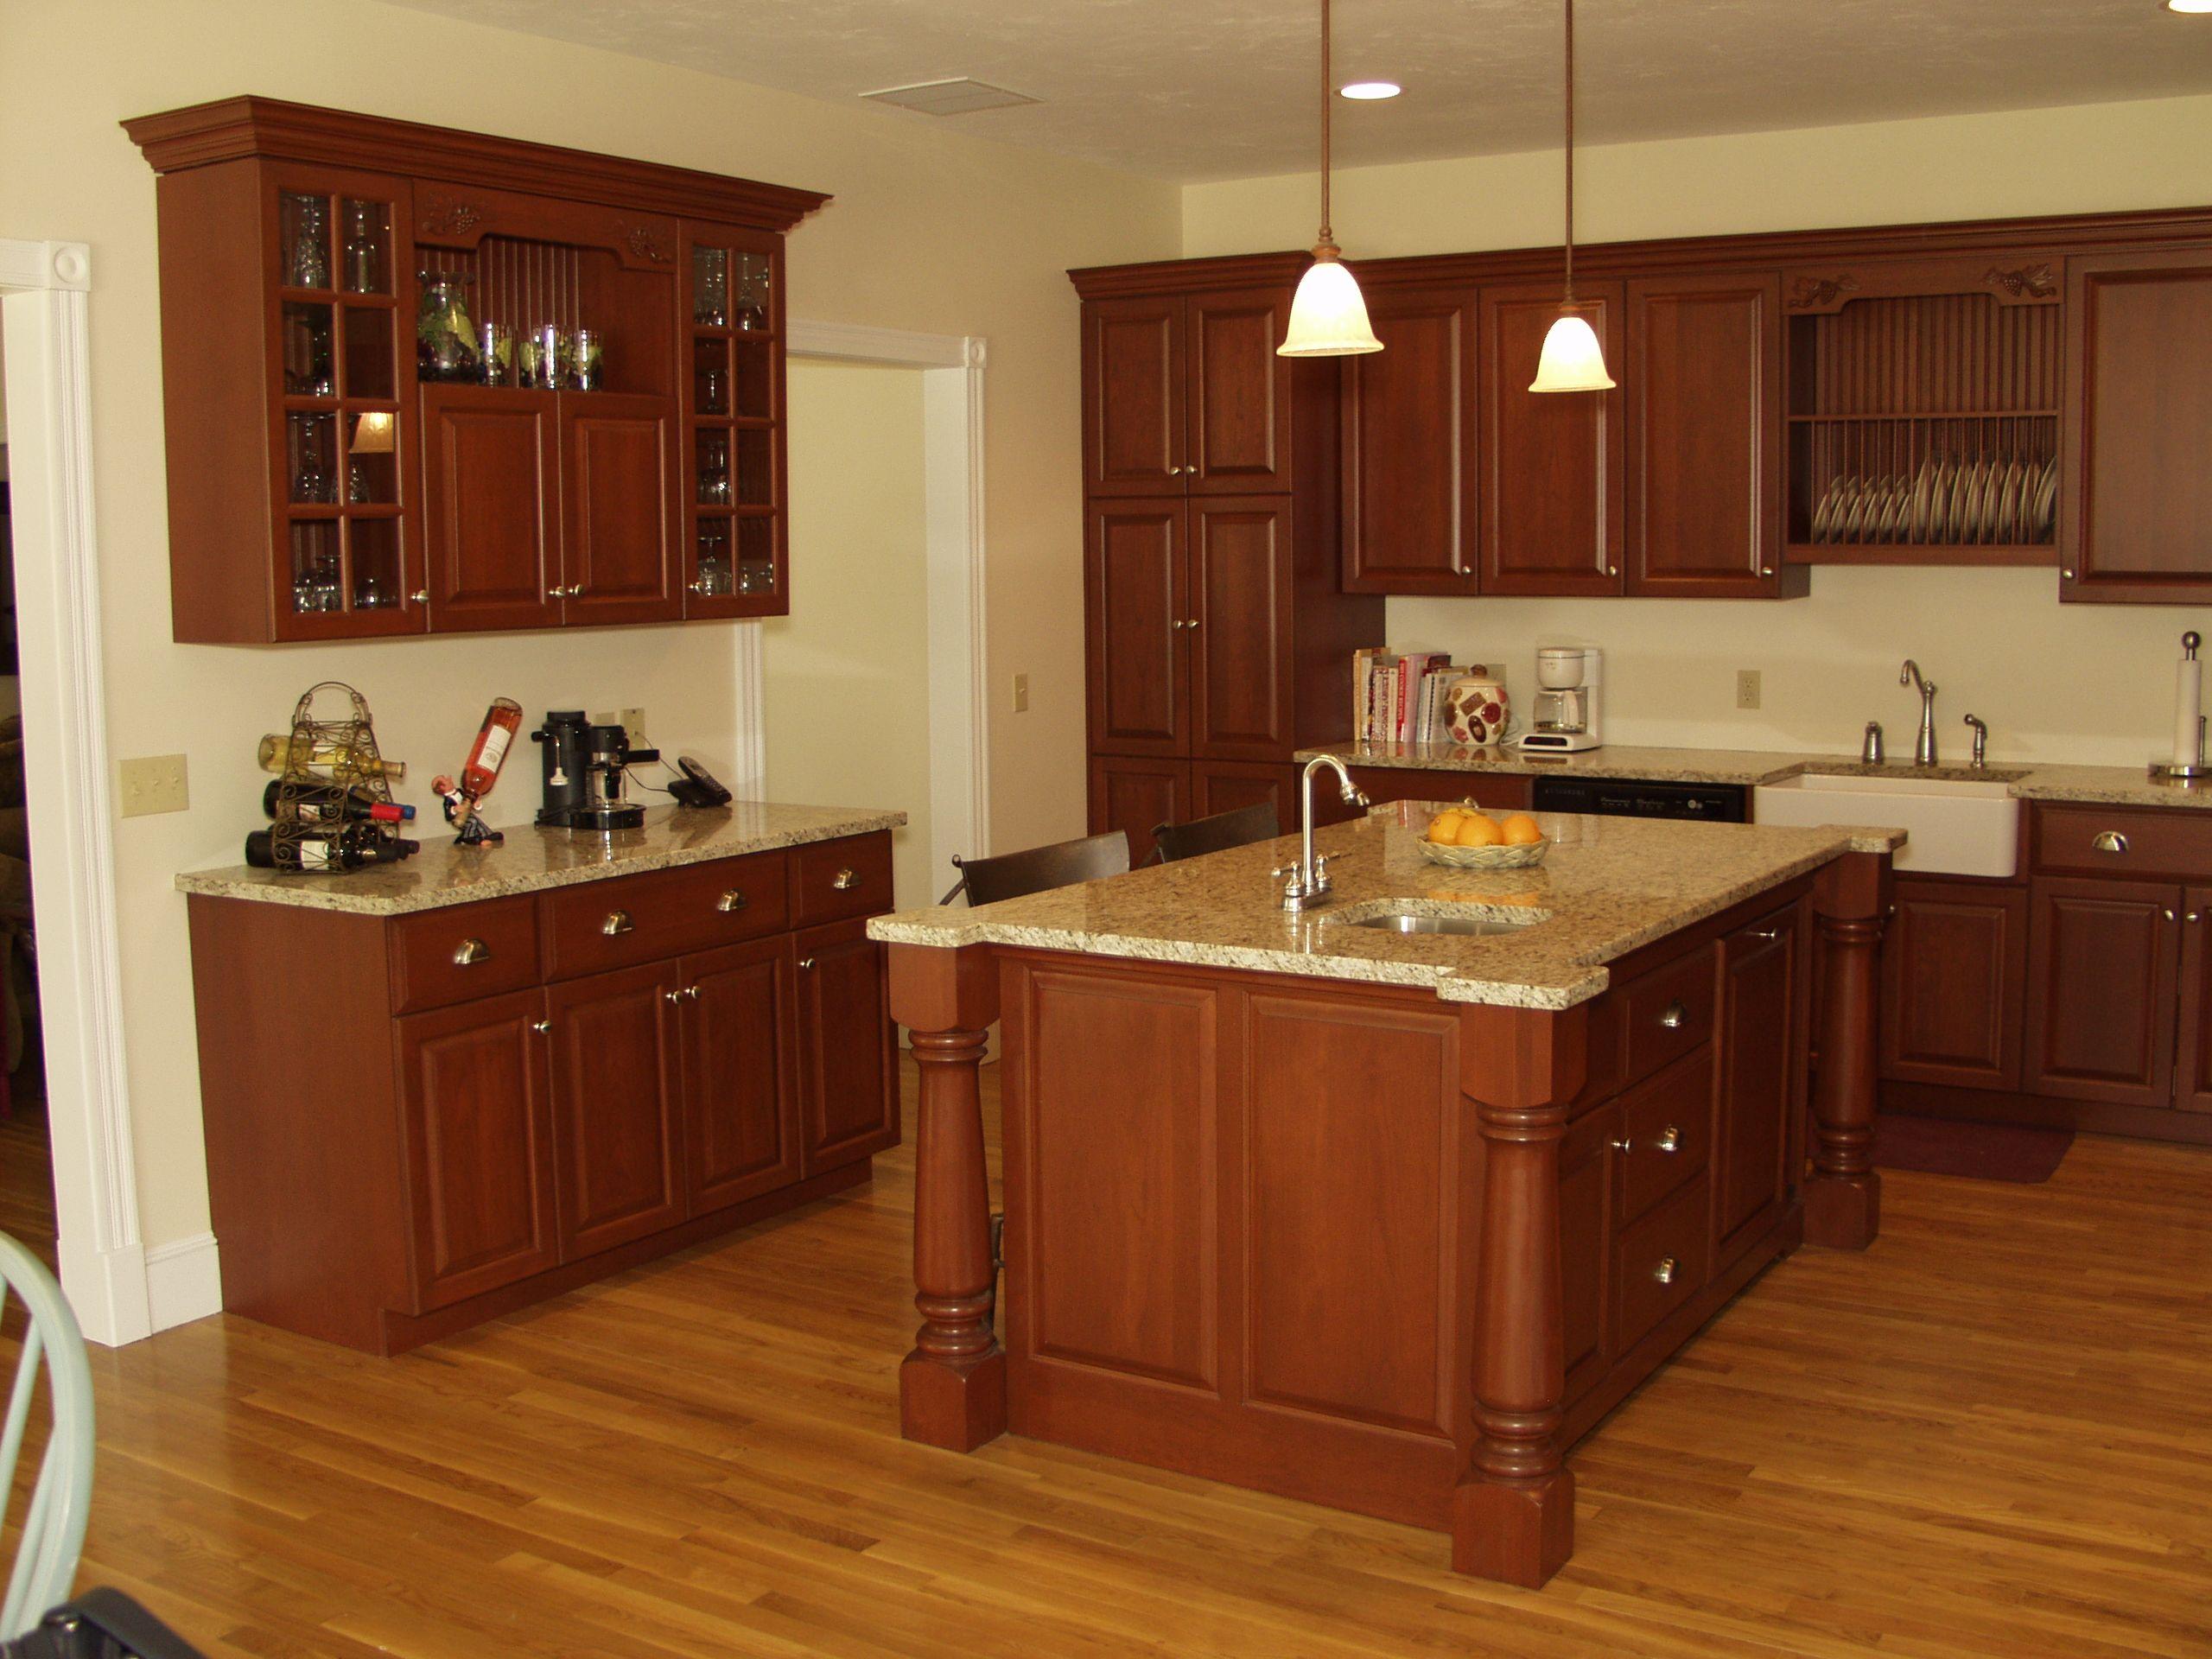 Saratoga Cinnamon Cabinets Cabinet Kitchen Cabinets Cabinet Door Styles